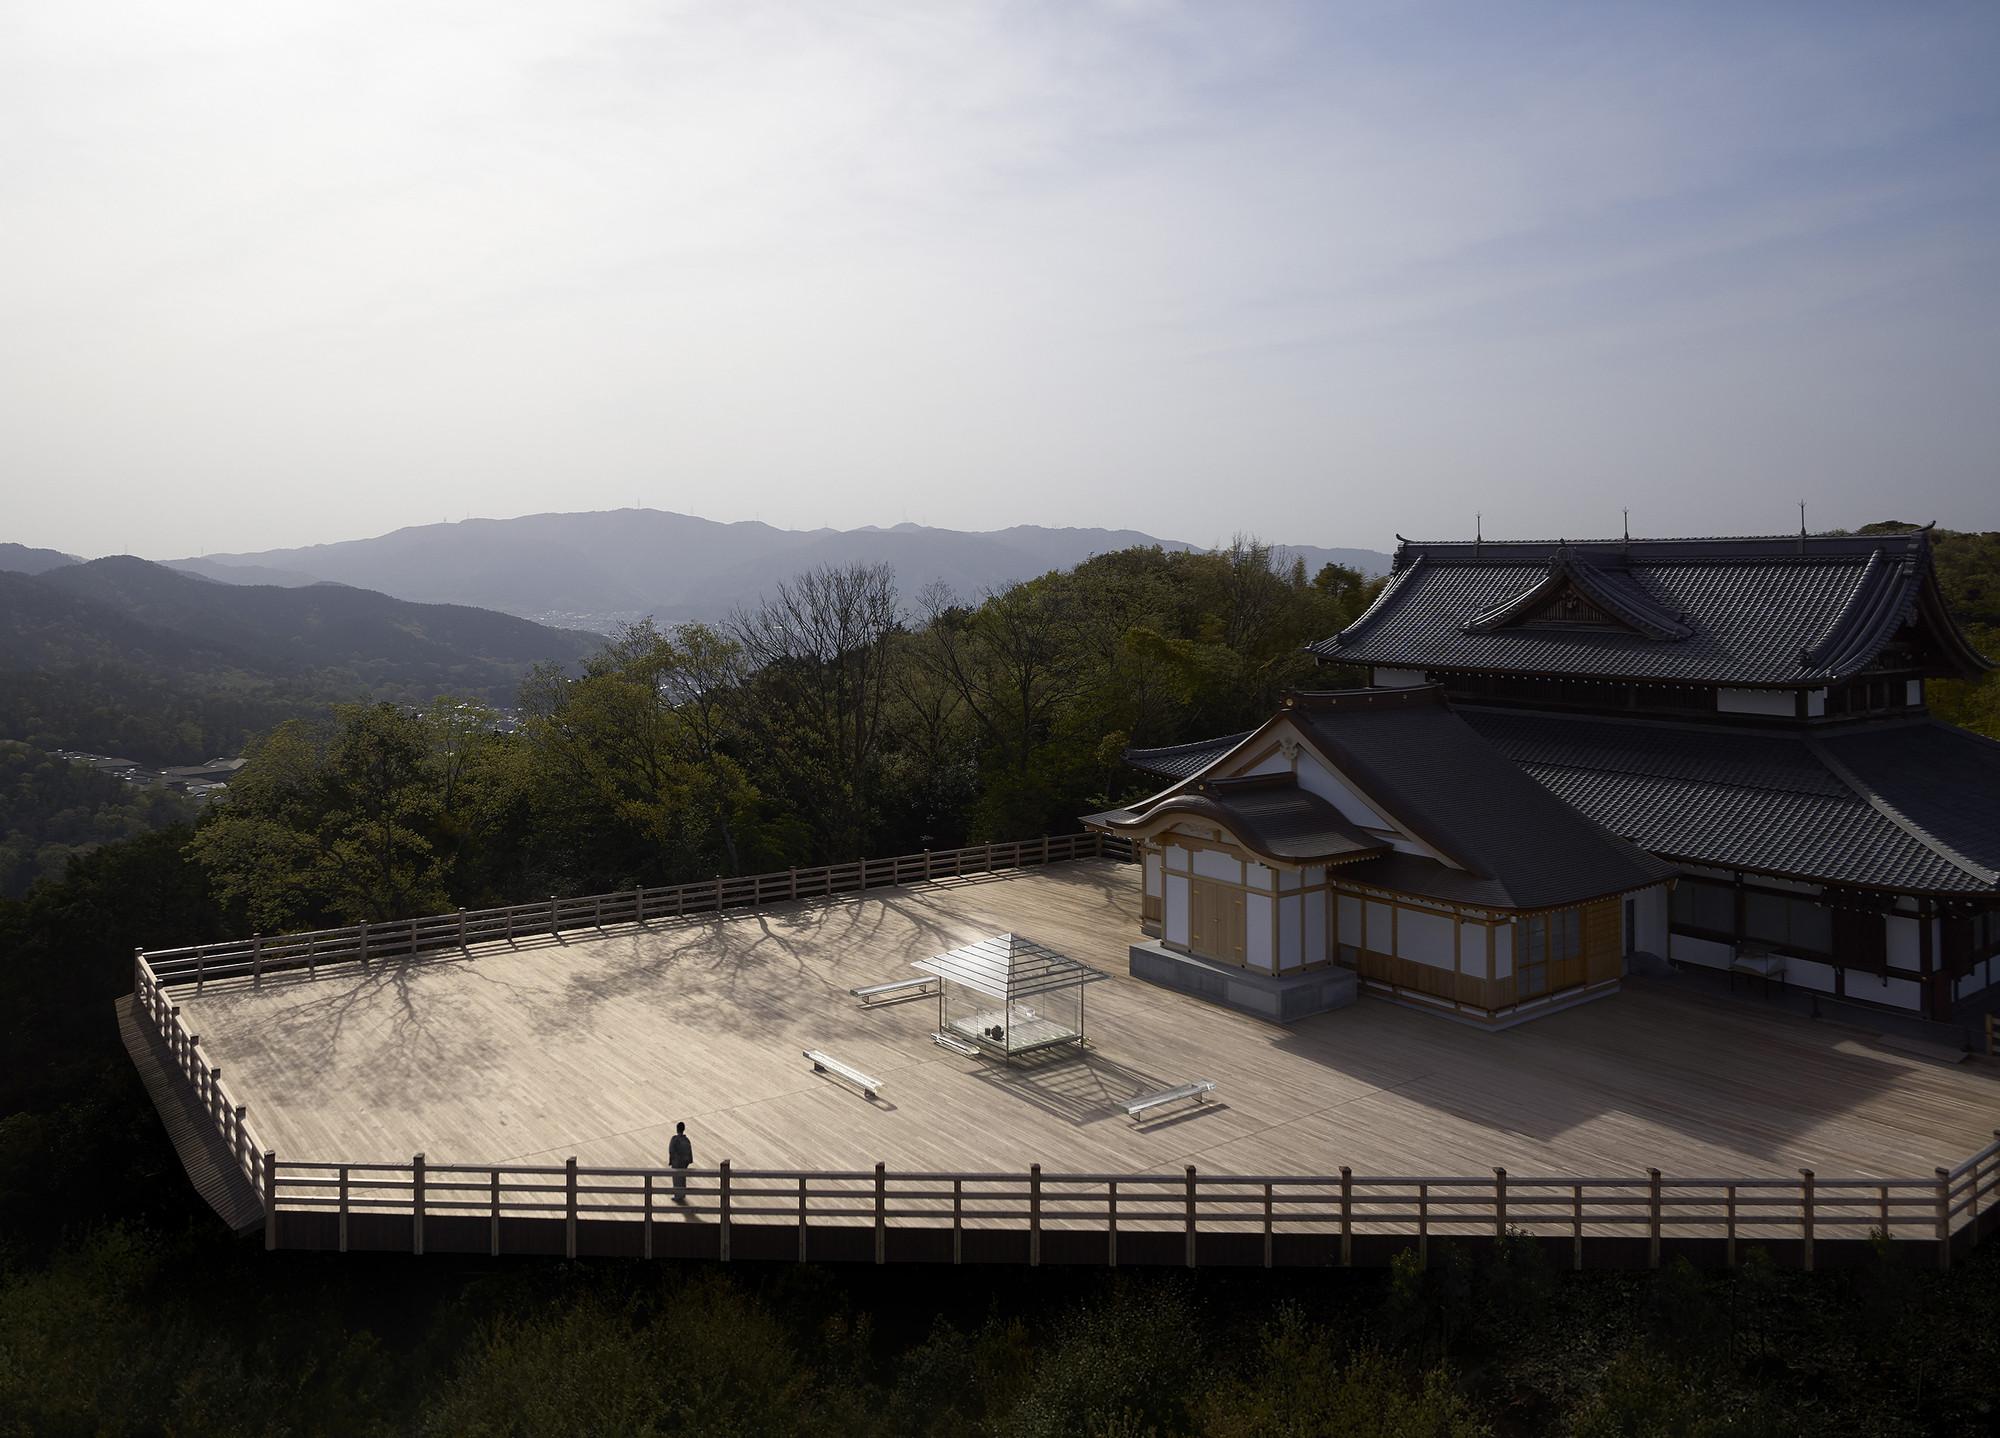 archaic_TokujinYoshioka_GlassHouse_25.jpg